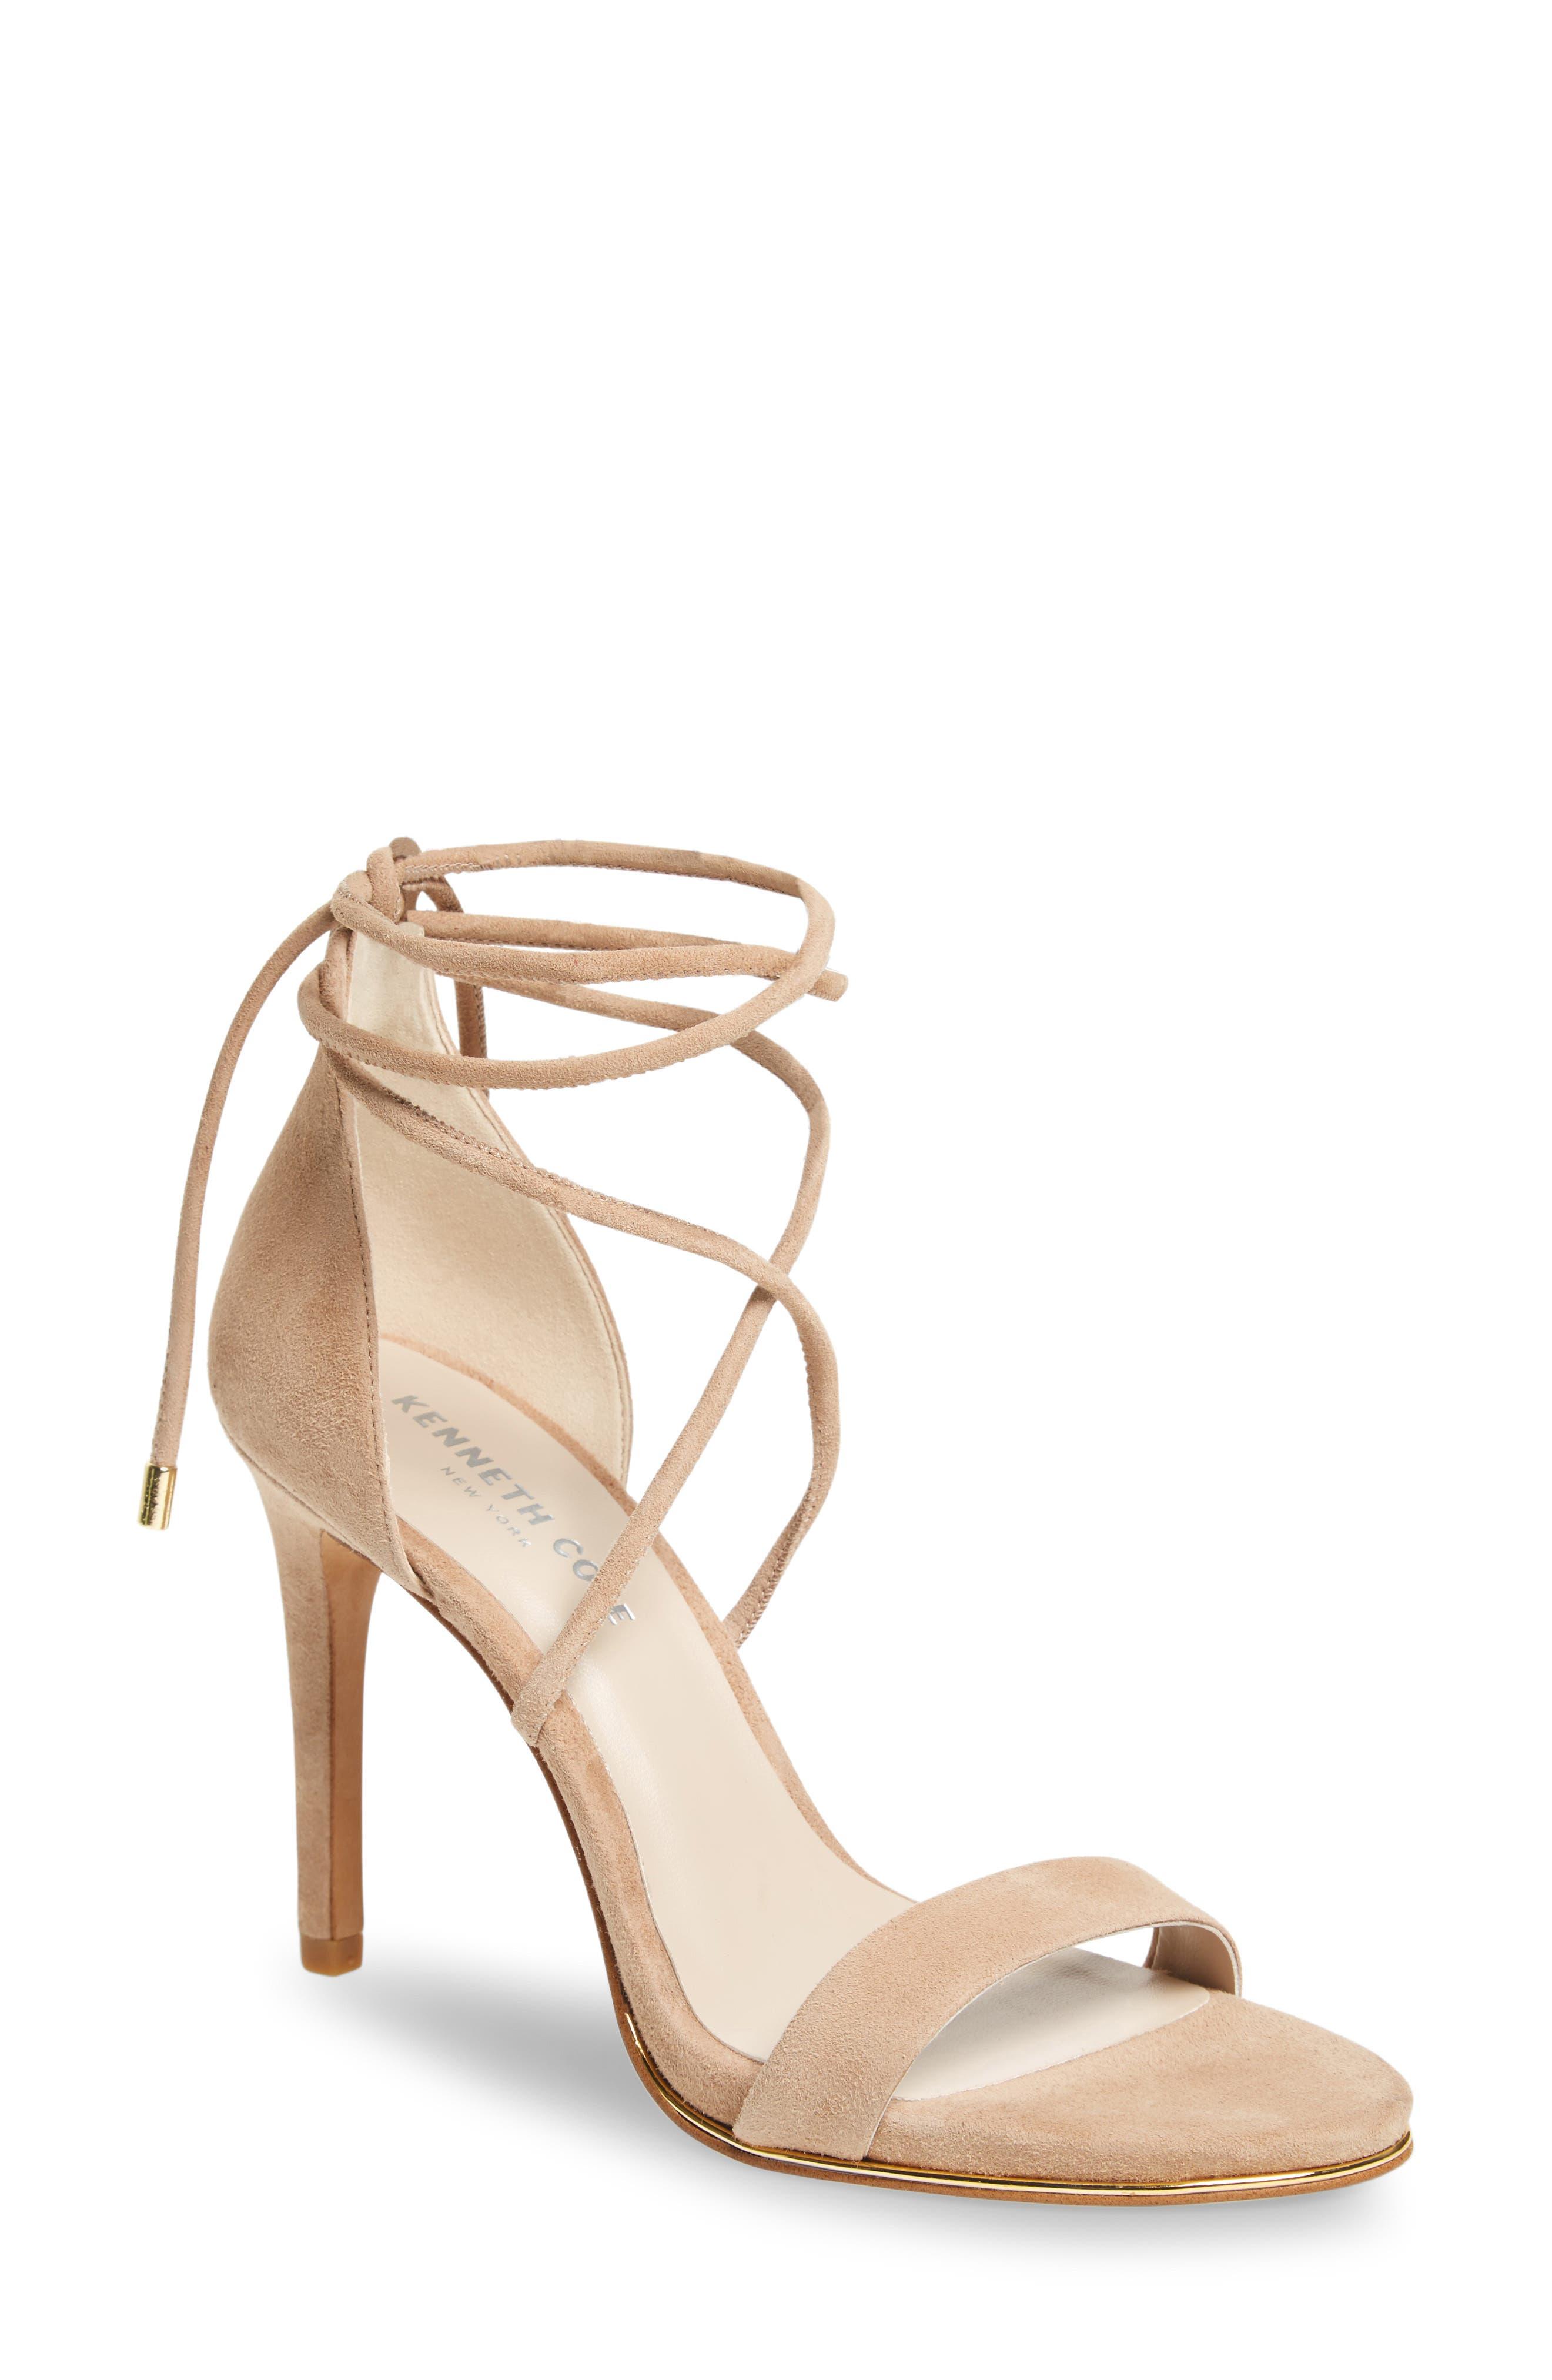 Kenneth Cole New York Berry Wraparound Sandal (Women)